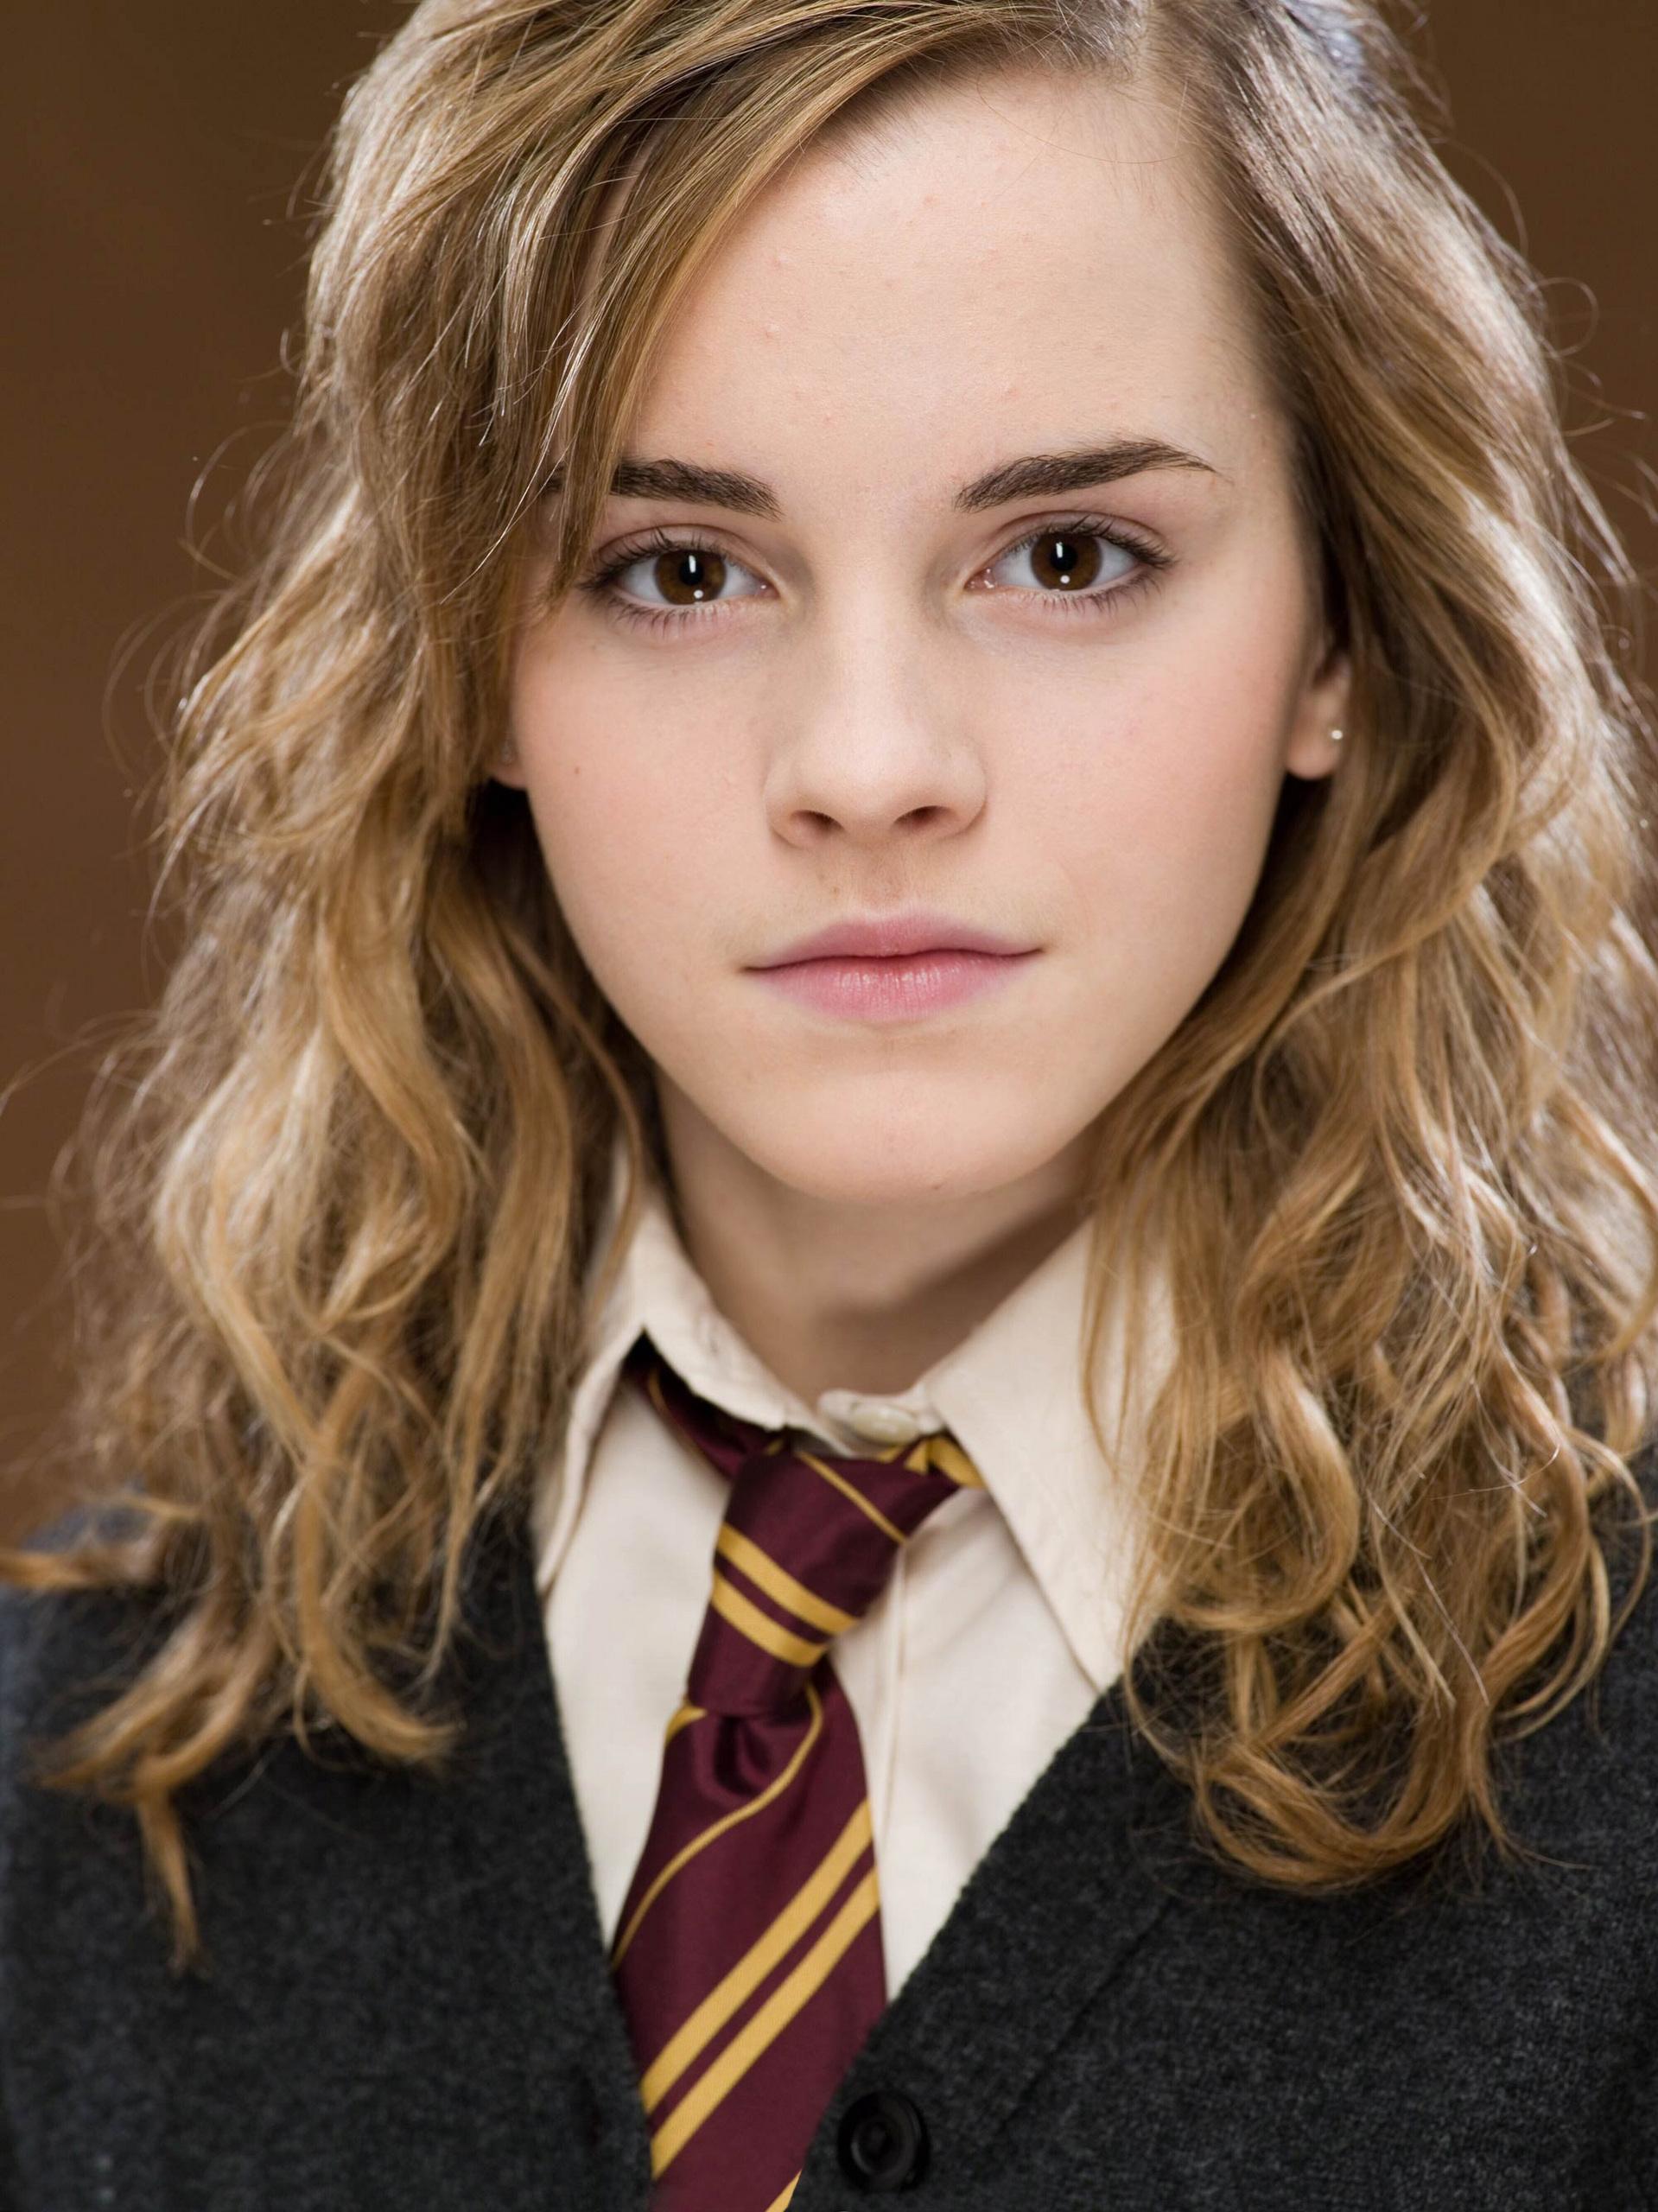 Image result for hermione granger hot